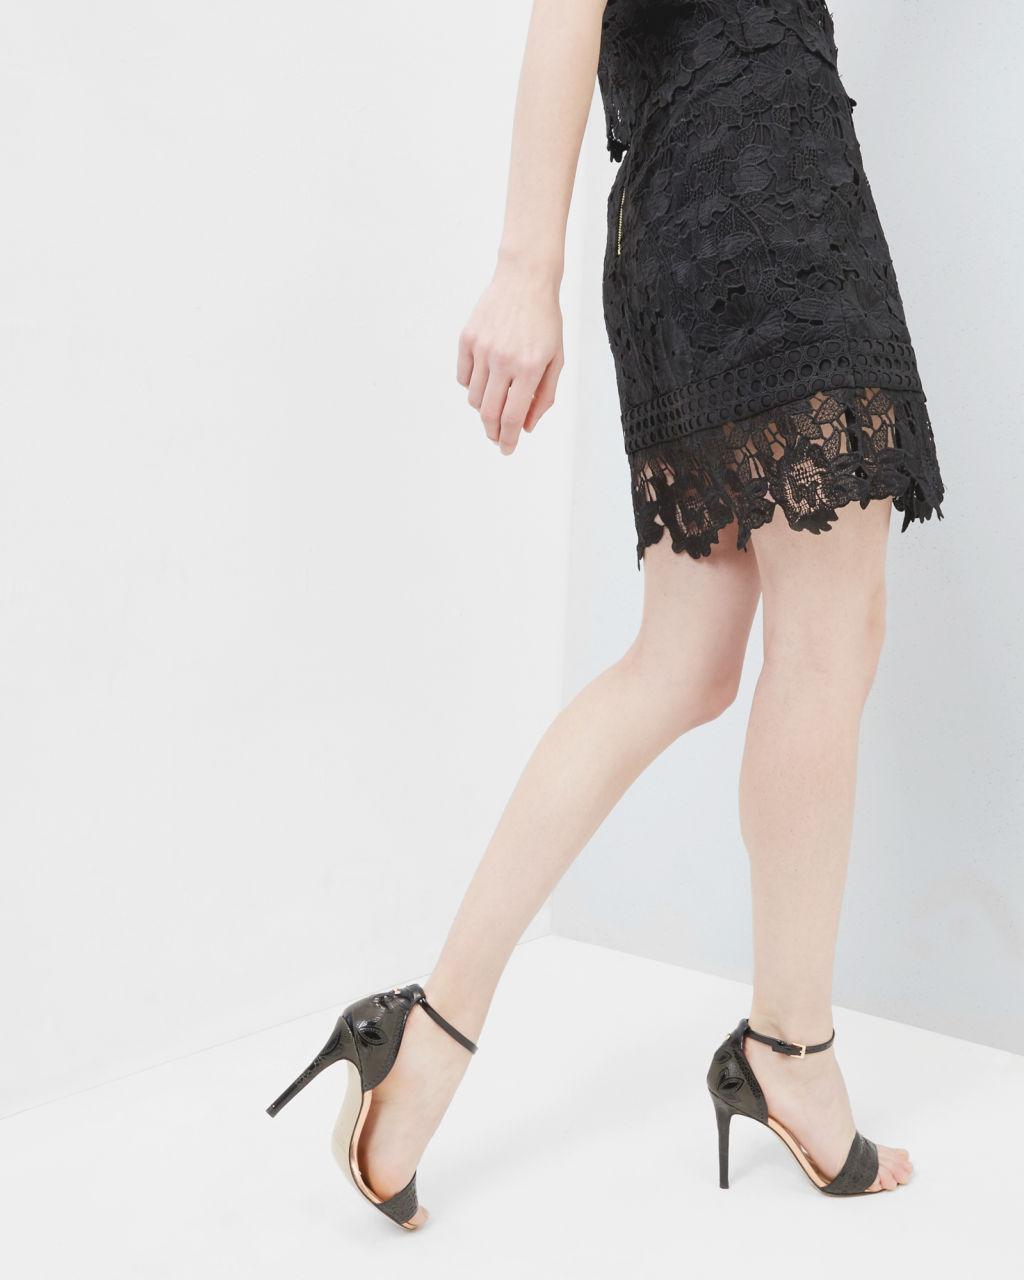 uk-Womens-Clothing-Skirts-BEAY-Lace-mini-skirt--Black-XS7W_BEAY_BLACK_4.jpg.jpg